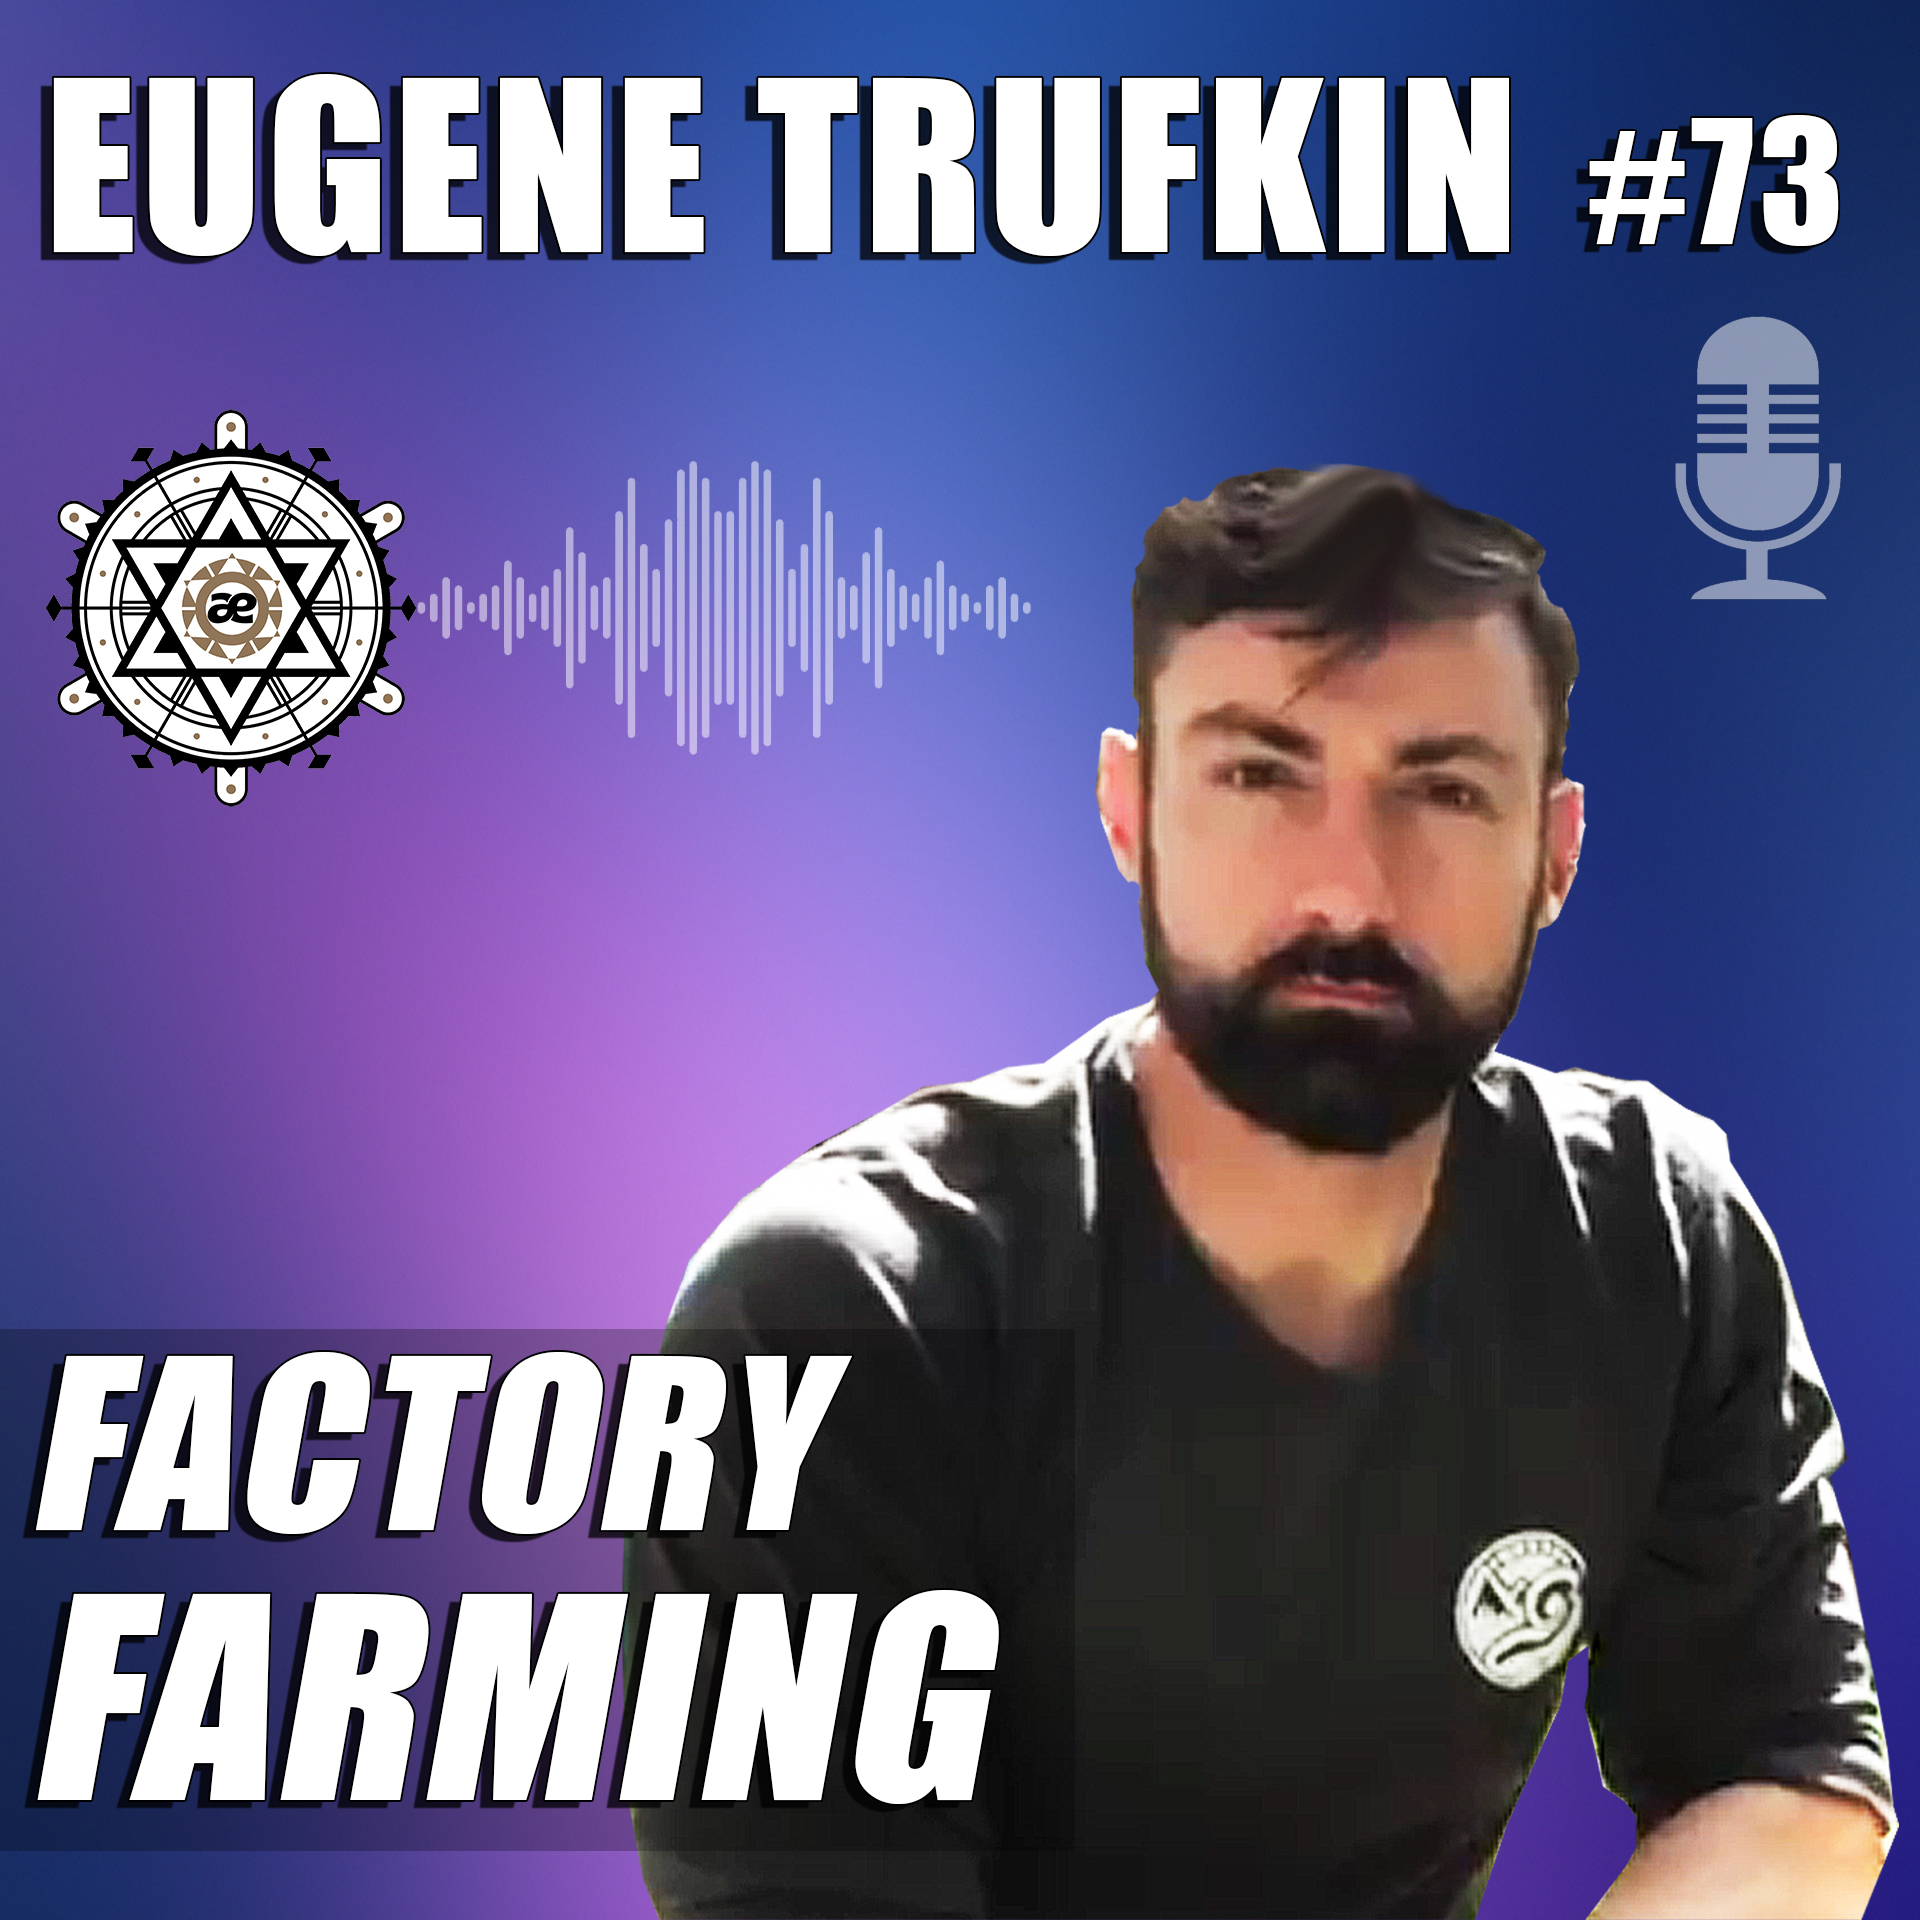 EP73 - Eugene Trufkin - Factory Farming